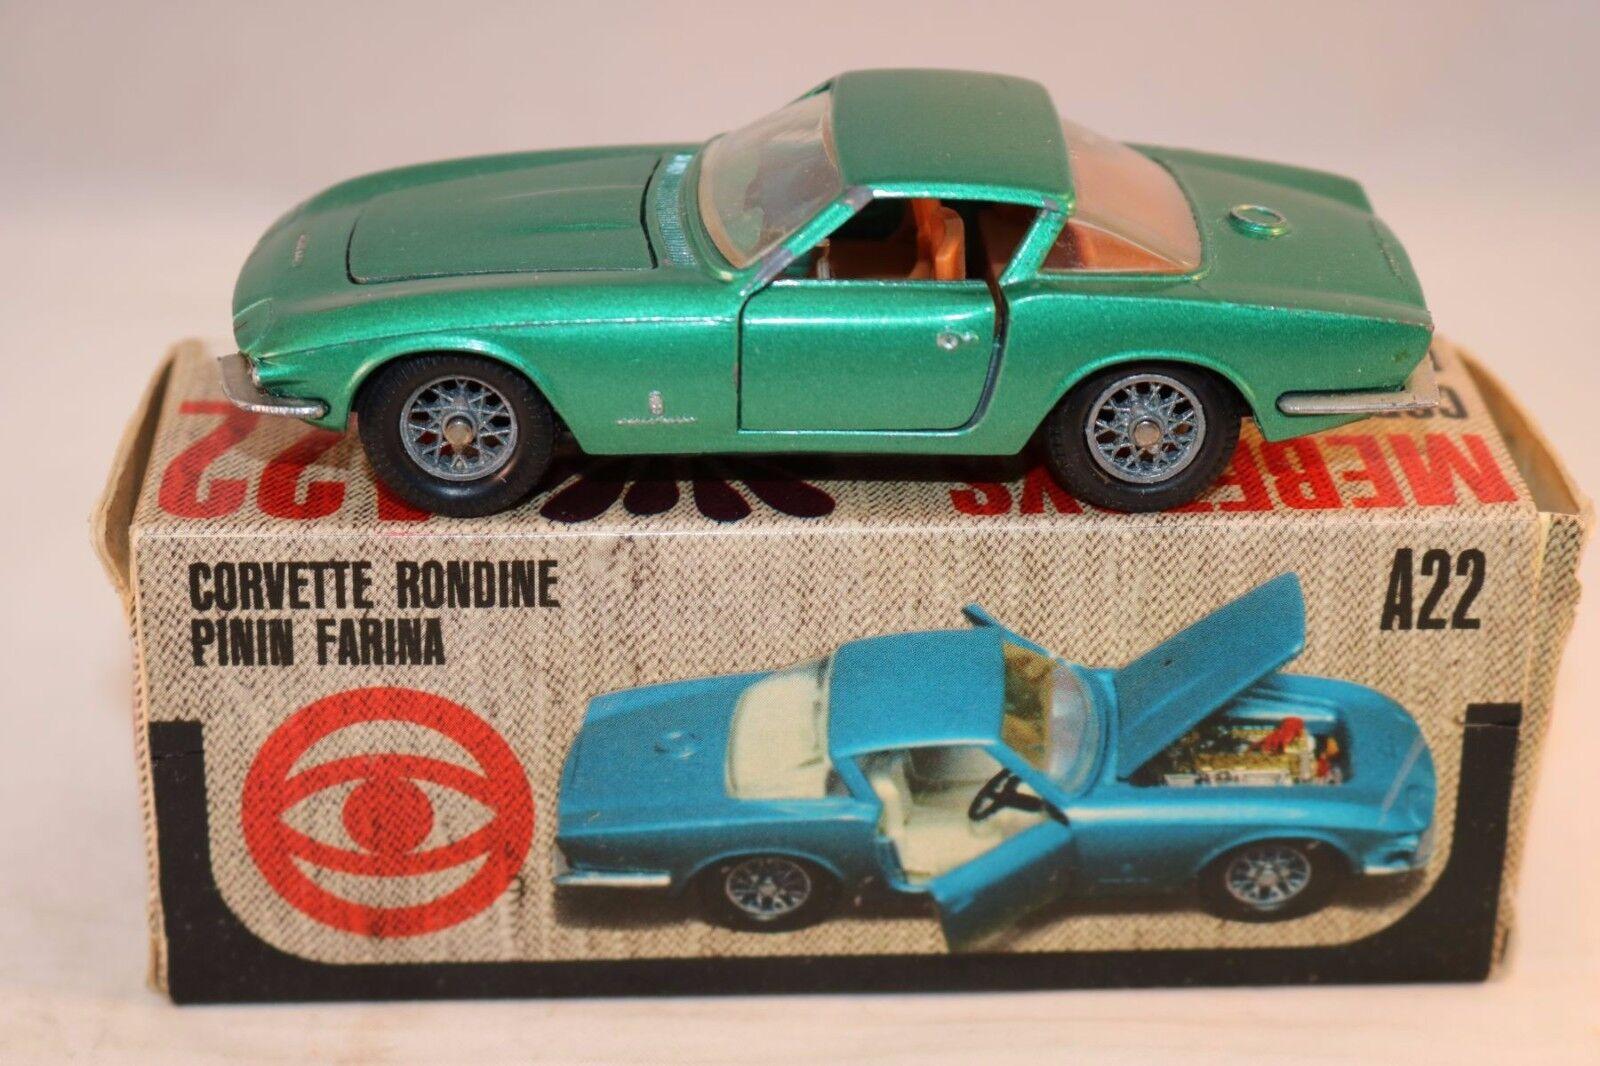 Mebetoys A22 Corvette Rondine Pinin Farina Green near mint in box